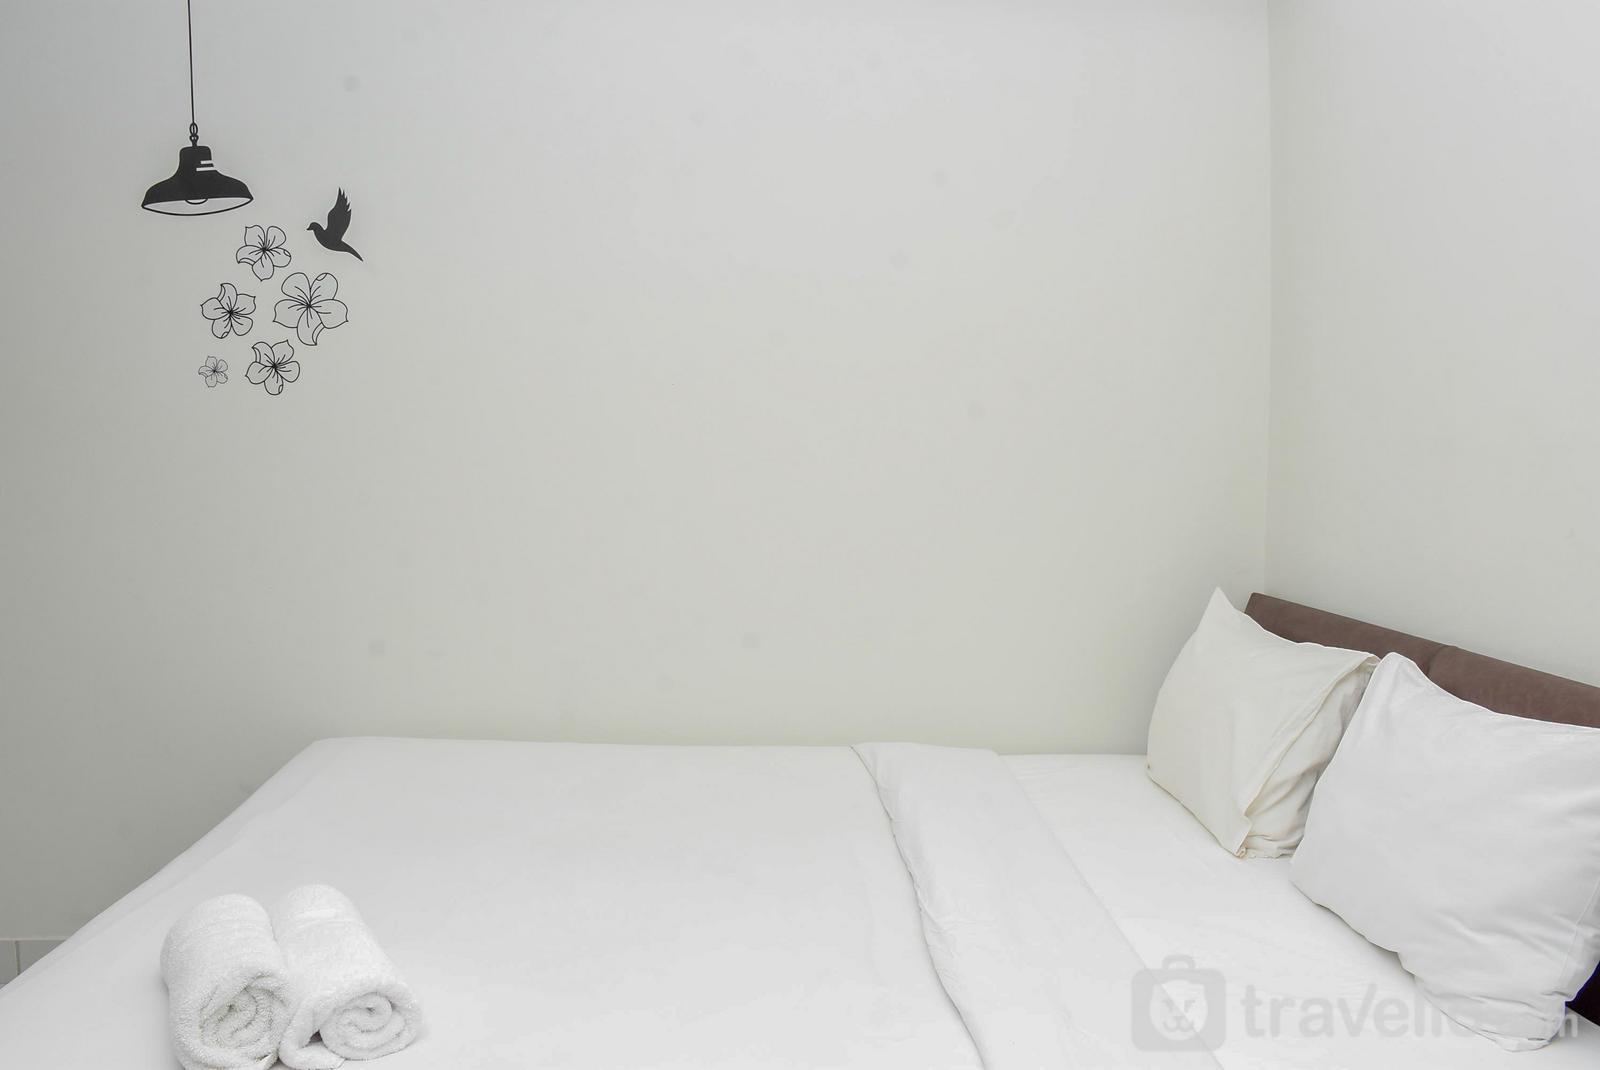 Apartemen Amethyst - Cozy and Comfy Studio at Amethyst Apartment By Travelio